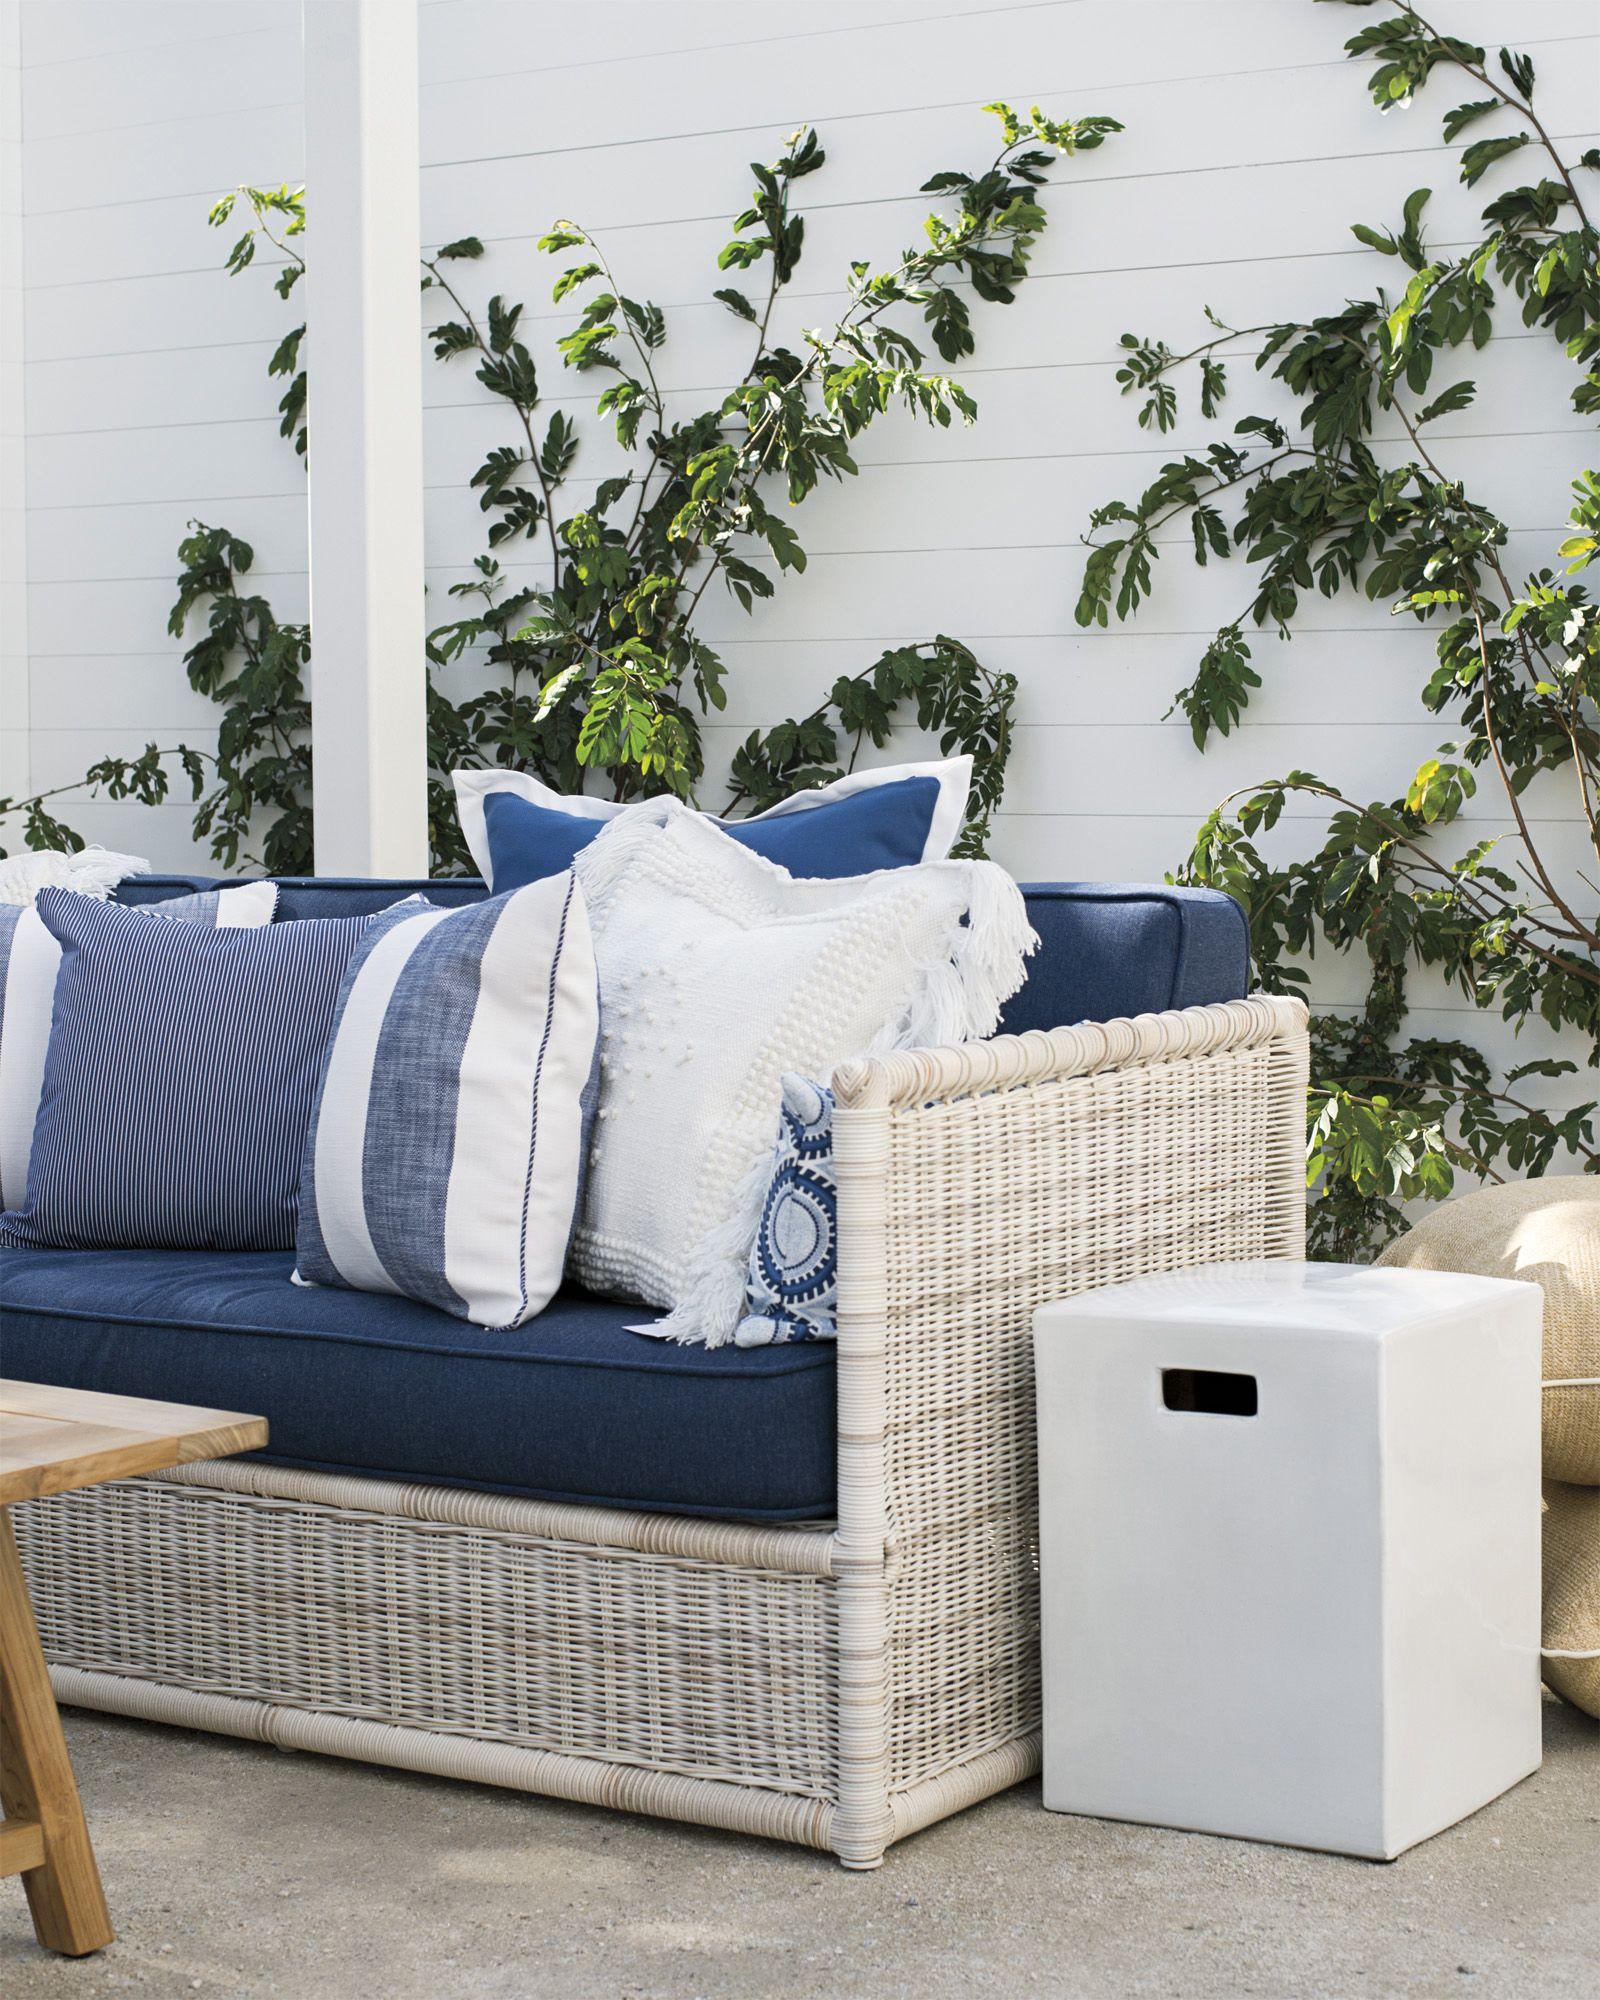 Serena And Lily Outdoor Pillows.Montecito Outdoor Pillow Cover Deck Outdoor Pillow